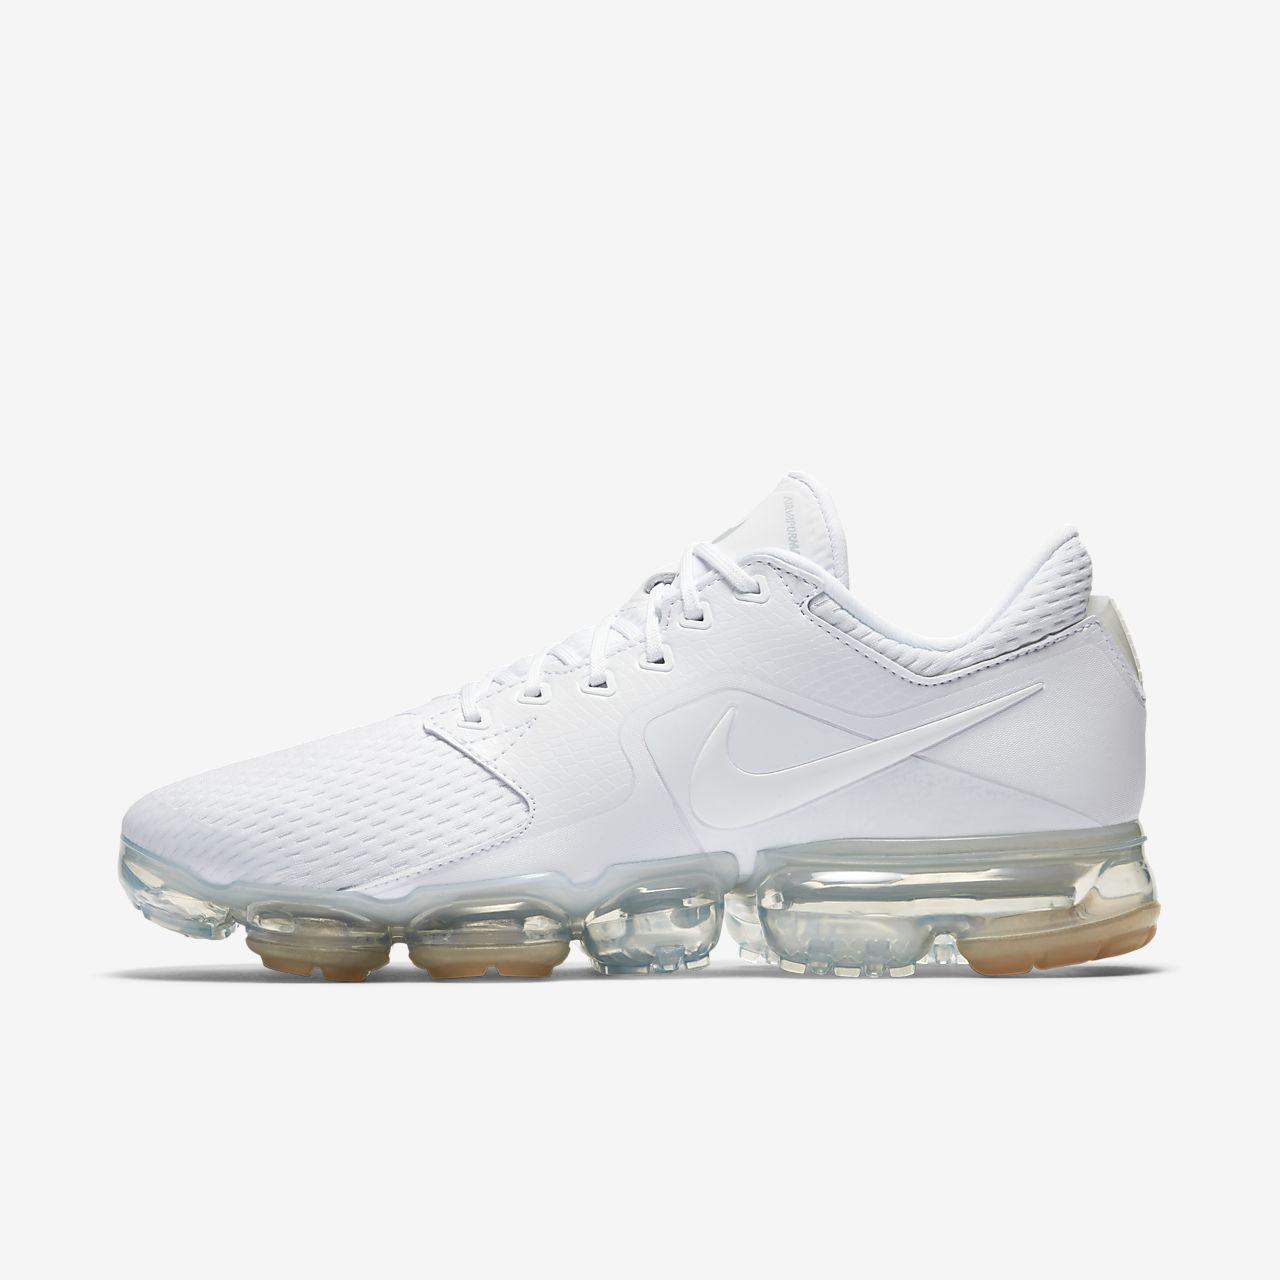 45efa0db9e ... italy chaussure de running nike air vapormax pour homme b3b88 1822b